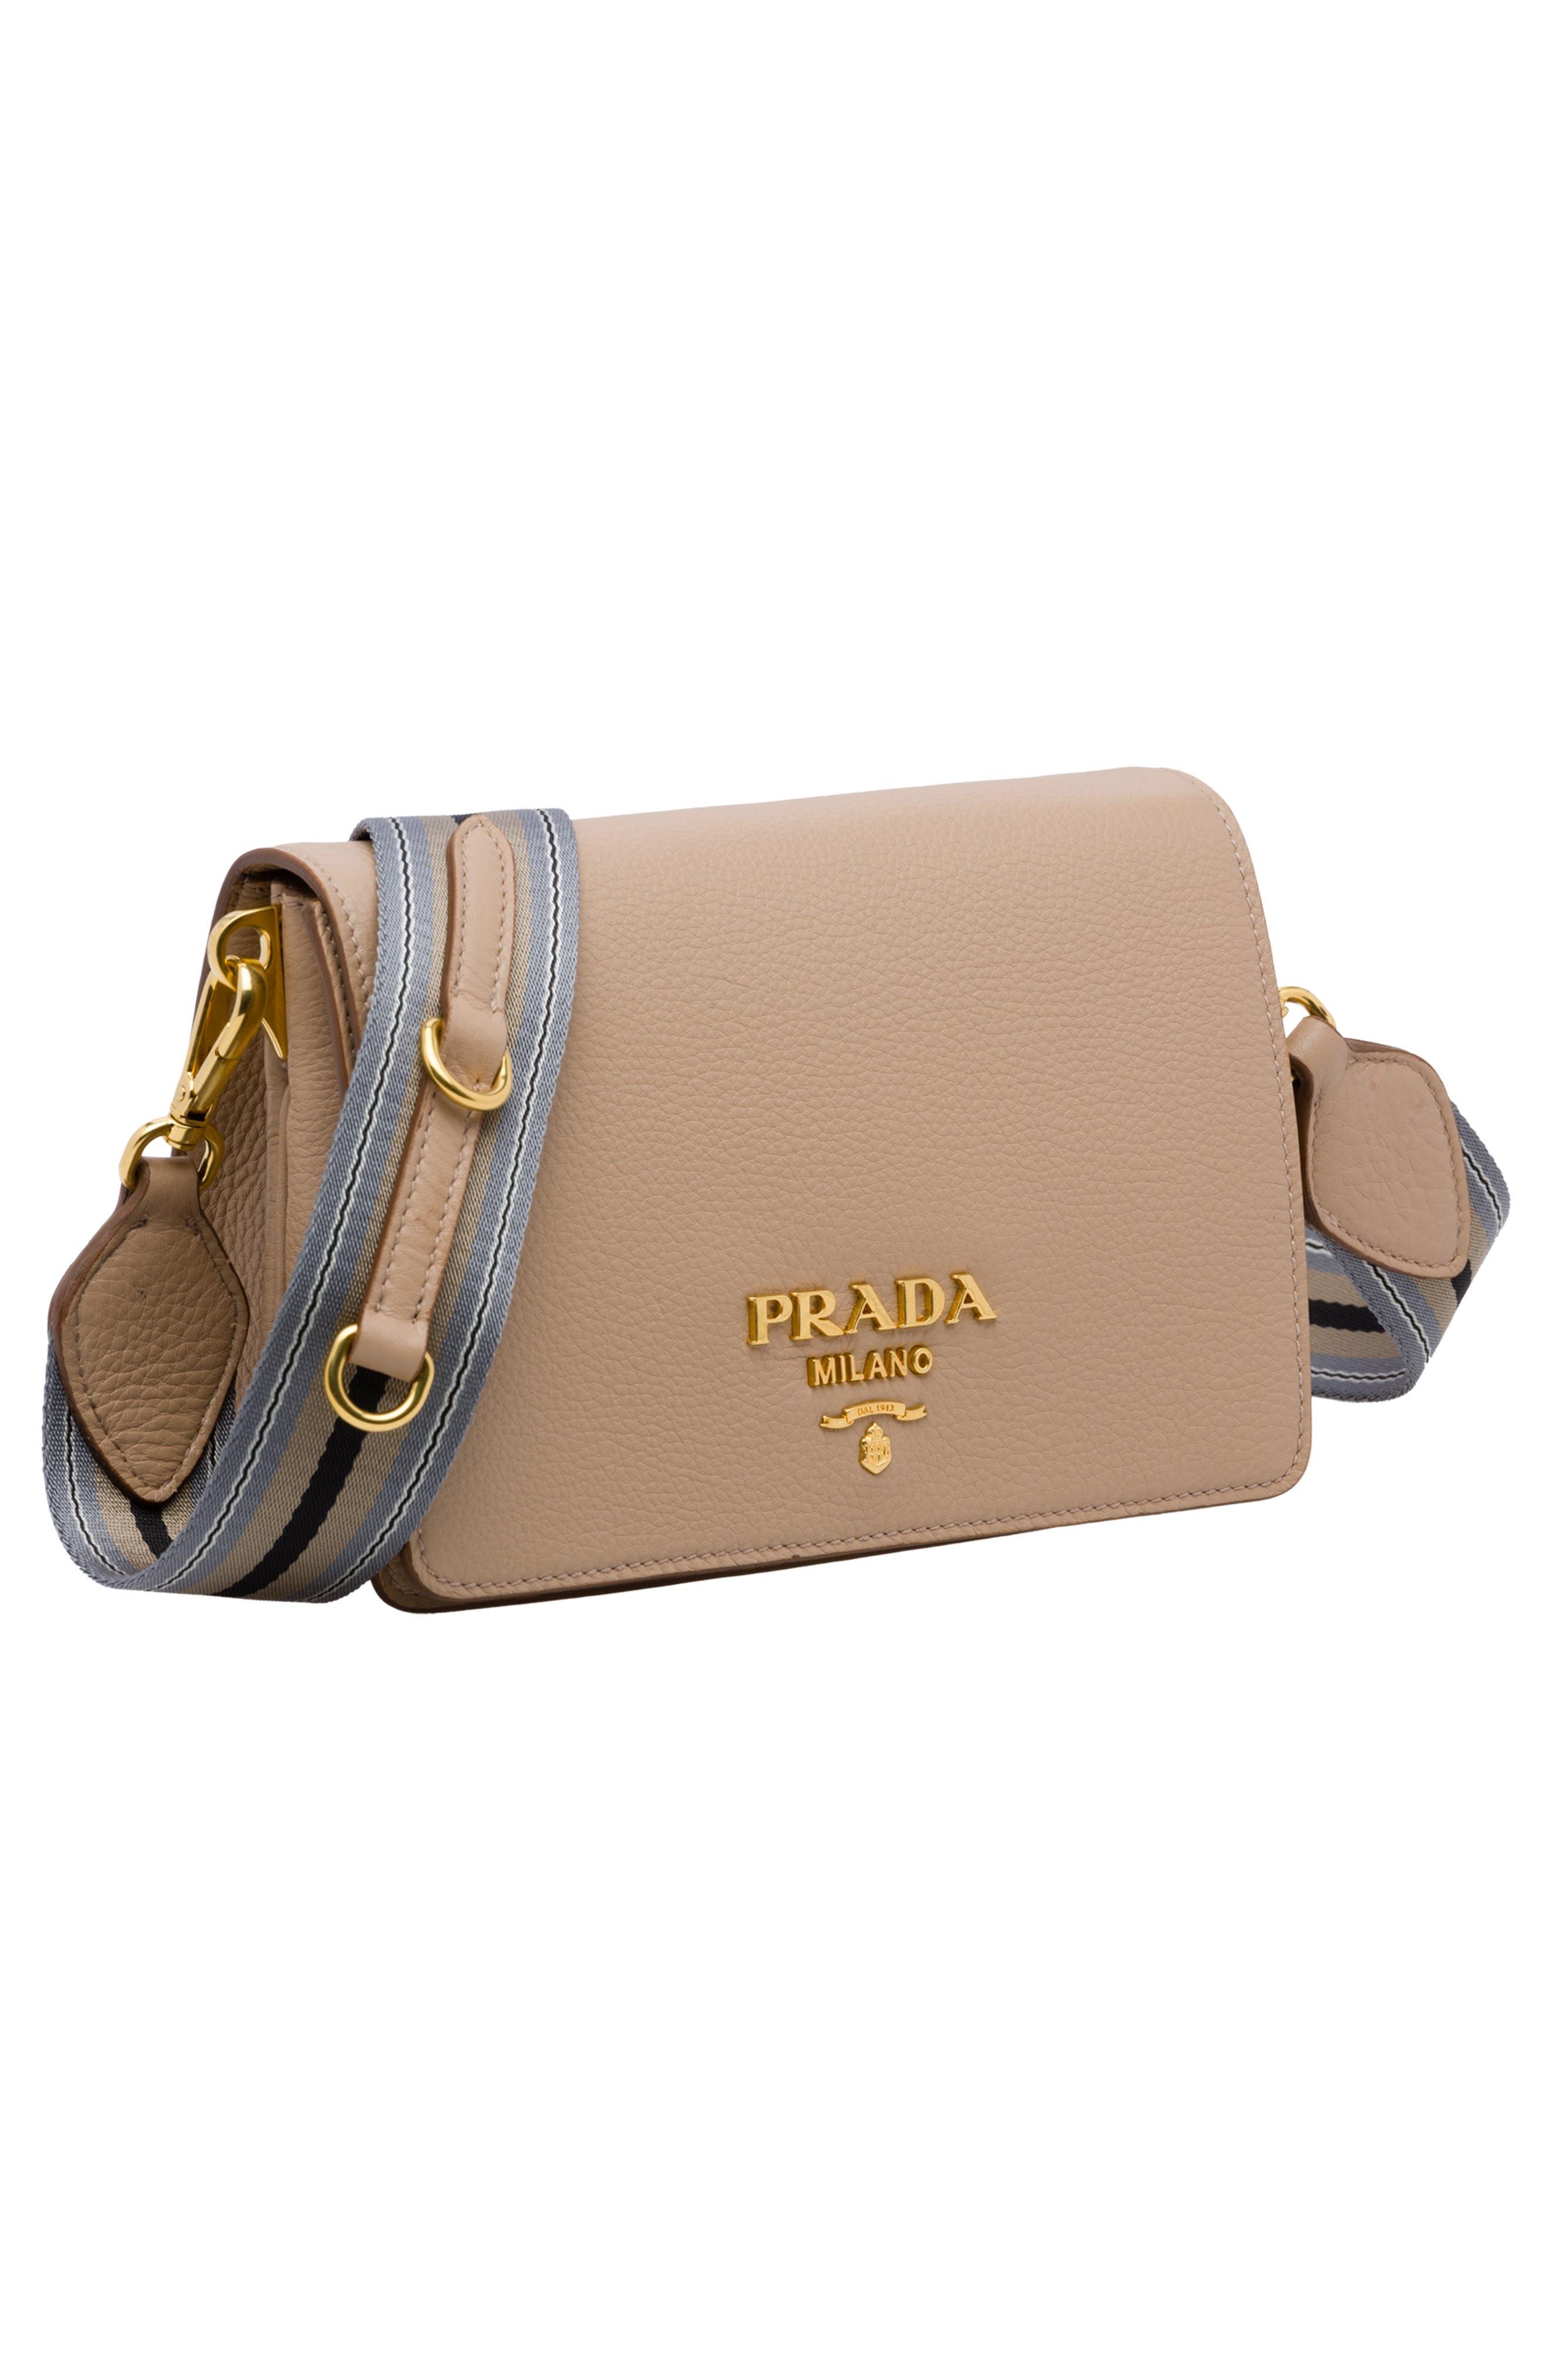 PRADA, Vitello Daino Double Compartment Leather Shoulder Bag, Alternate thumbnail 5, color, CAMMEO